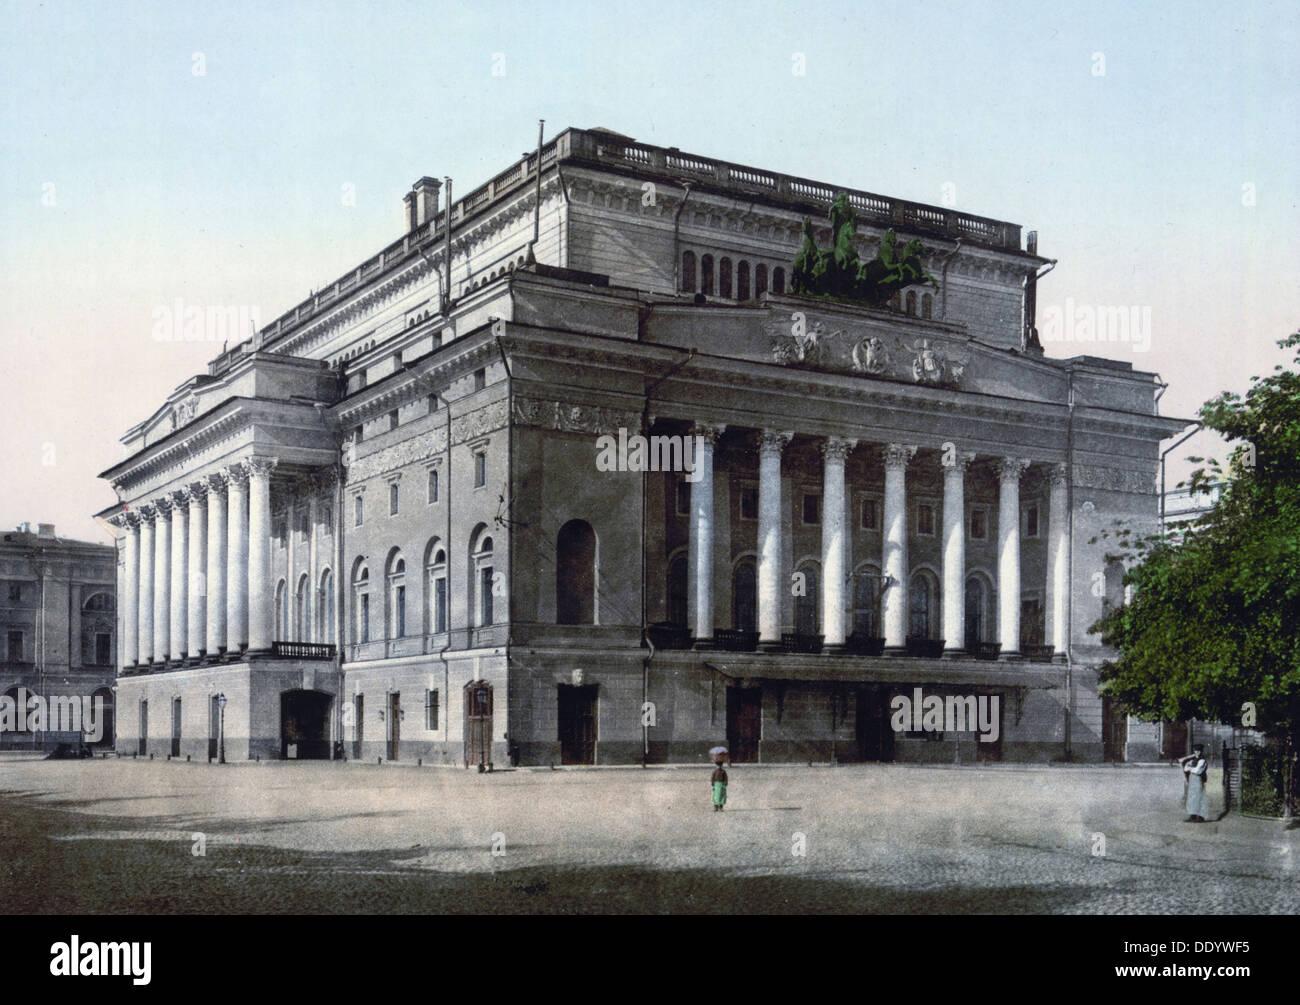 The Alexandrinsky Theatre, St Petersburg, Russia, c1890-c1905. Artist: Anon - Stock Image